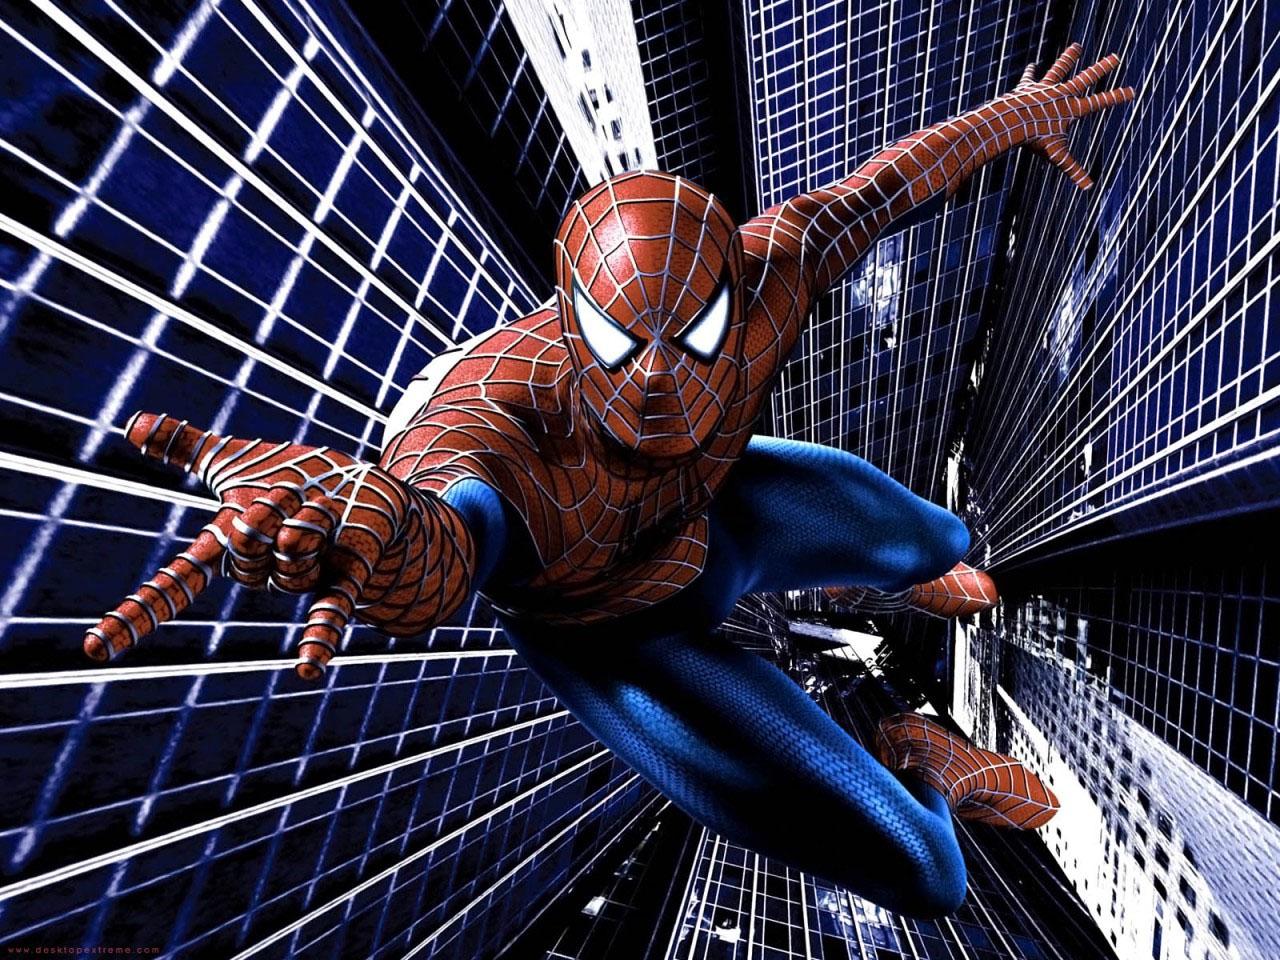 http://1.bp.blogspot.com/-jQrUDRULEZo/UDyssy0EIEI/AAAAAAAACfs/cDoLitwgjGM/s1600/spiderman02GR.jpg